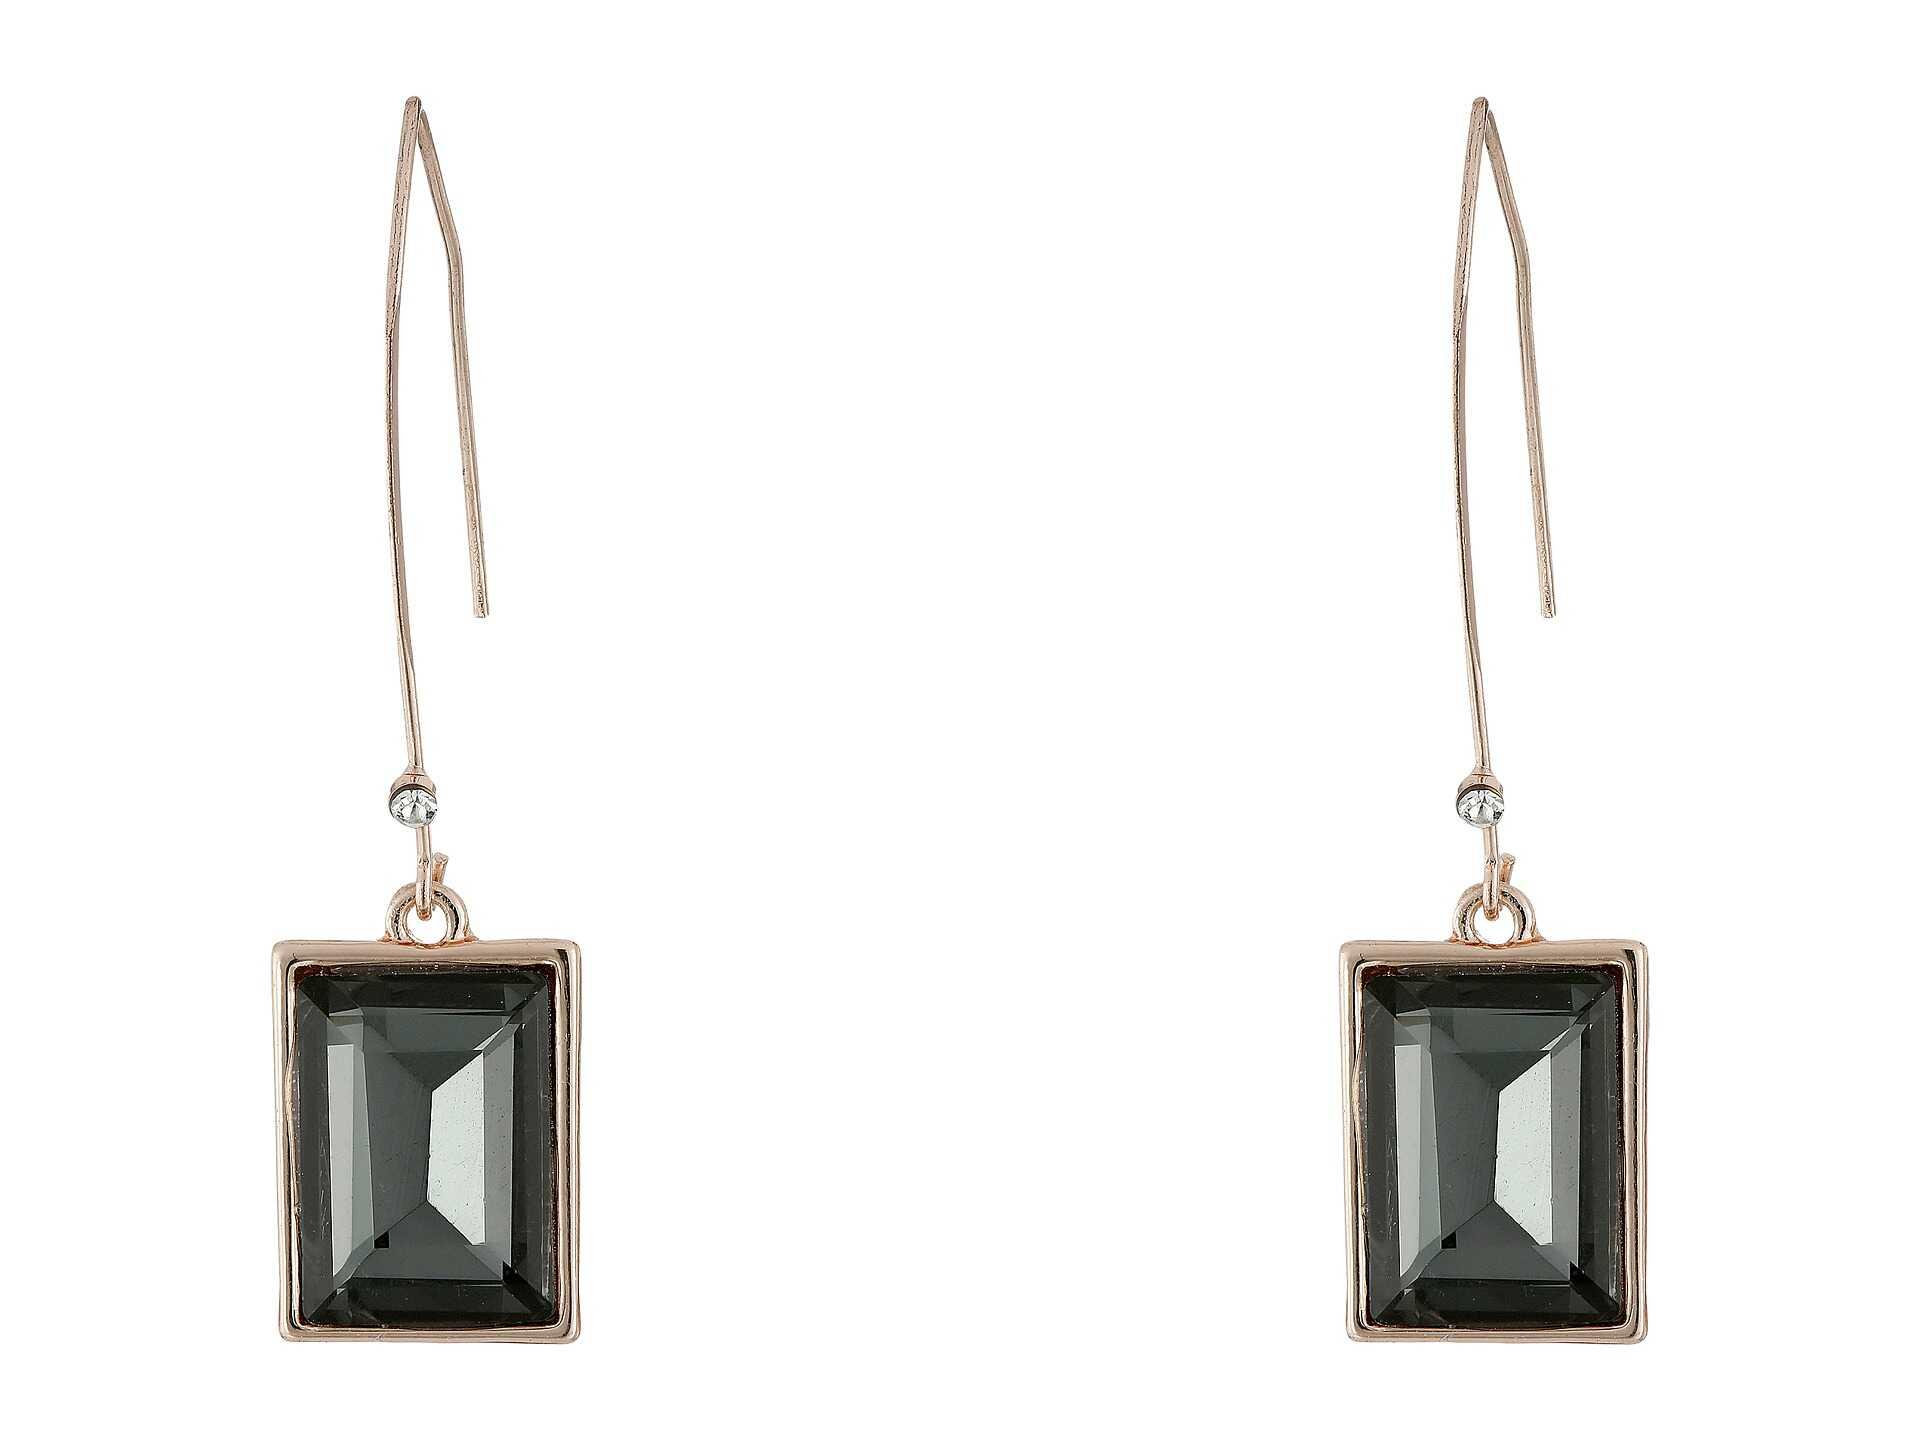 GUESS Emerald Cut Stone on Wire Drop Earrings Rose Gold/Black Diamond